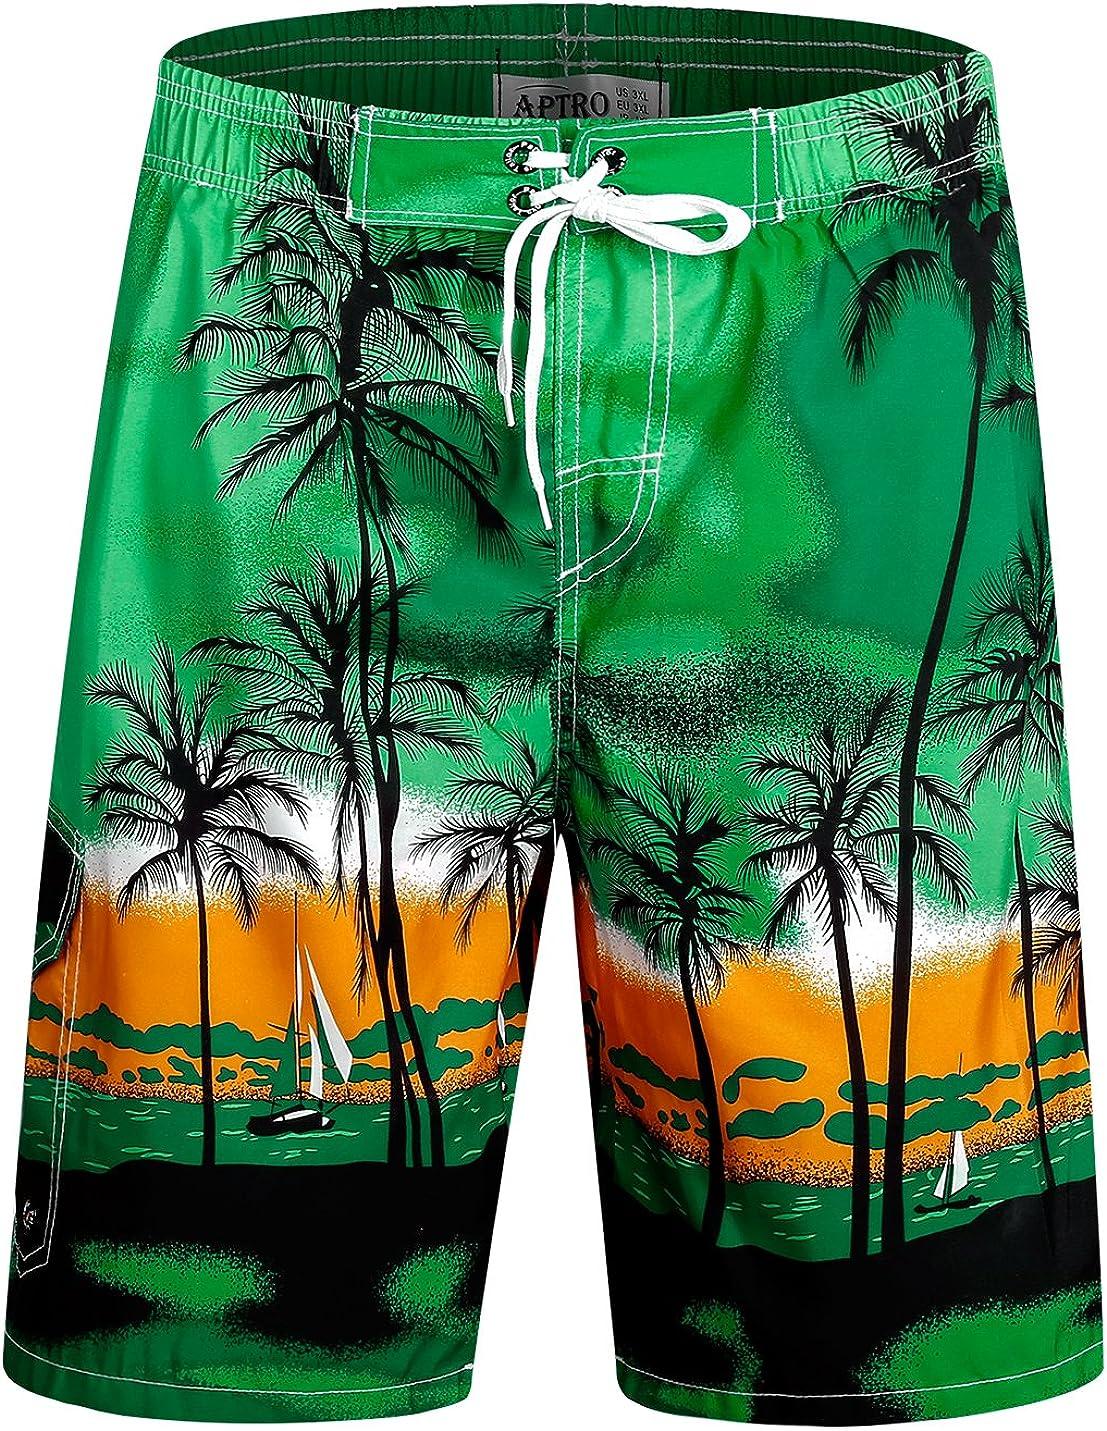 APTRO Men's Swimming Trunks with Pockets Beach Swimwear Quick Dry Elastic Waist Board Shorts